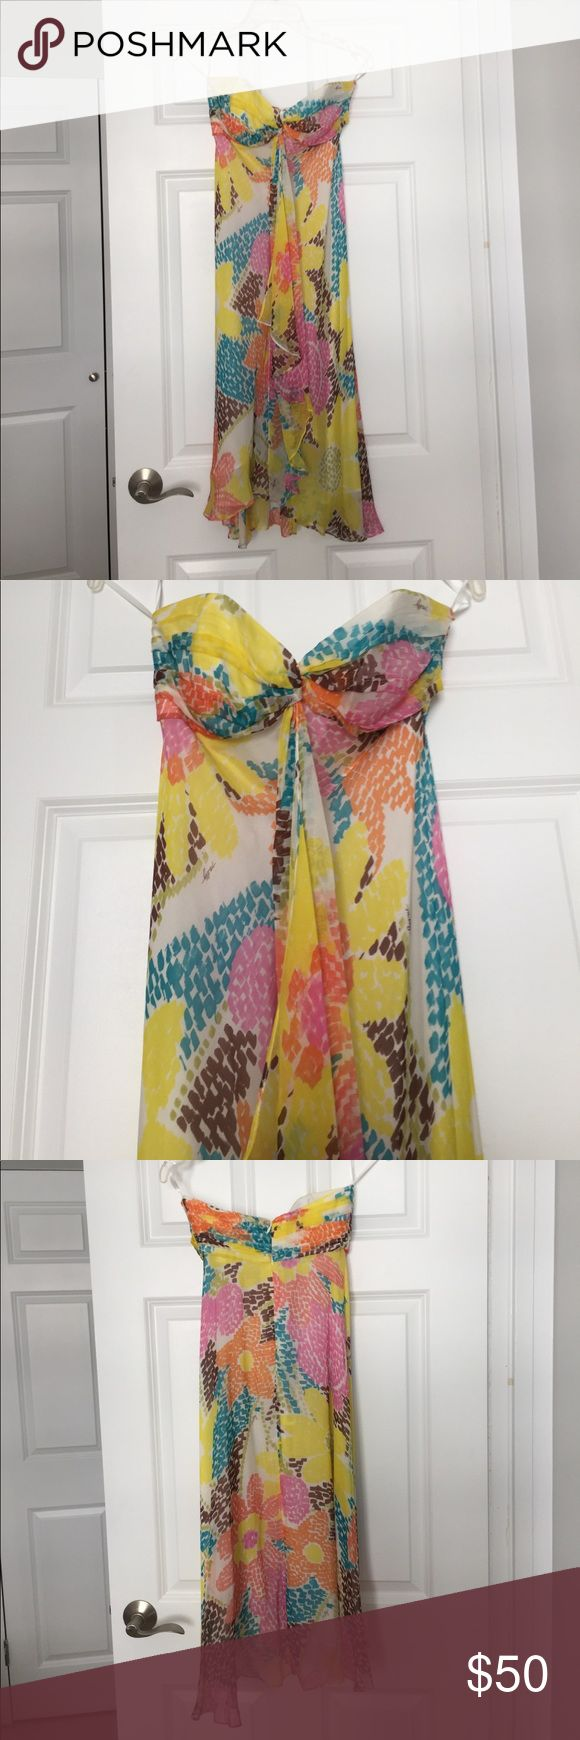 Milly multicolor strapless sundress Chiffon midi dress Milly of New York Dresses Midi